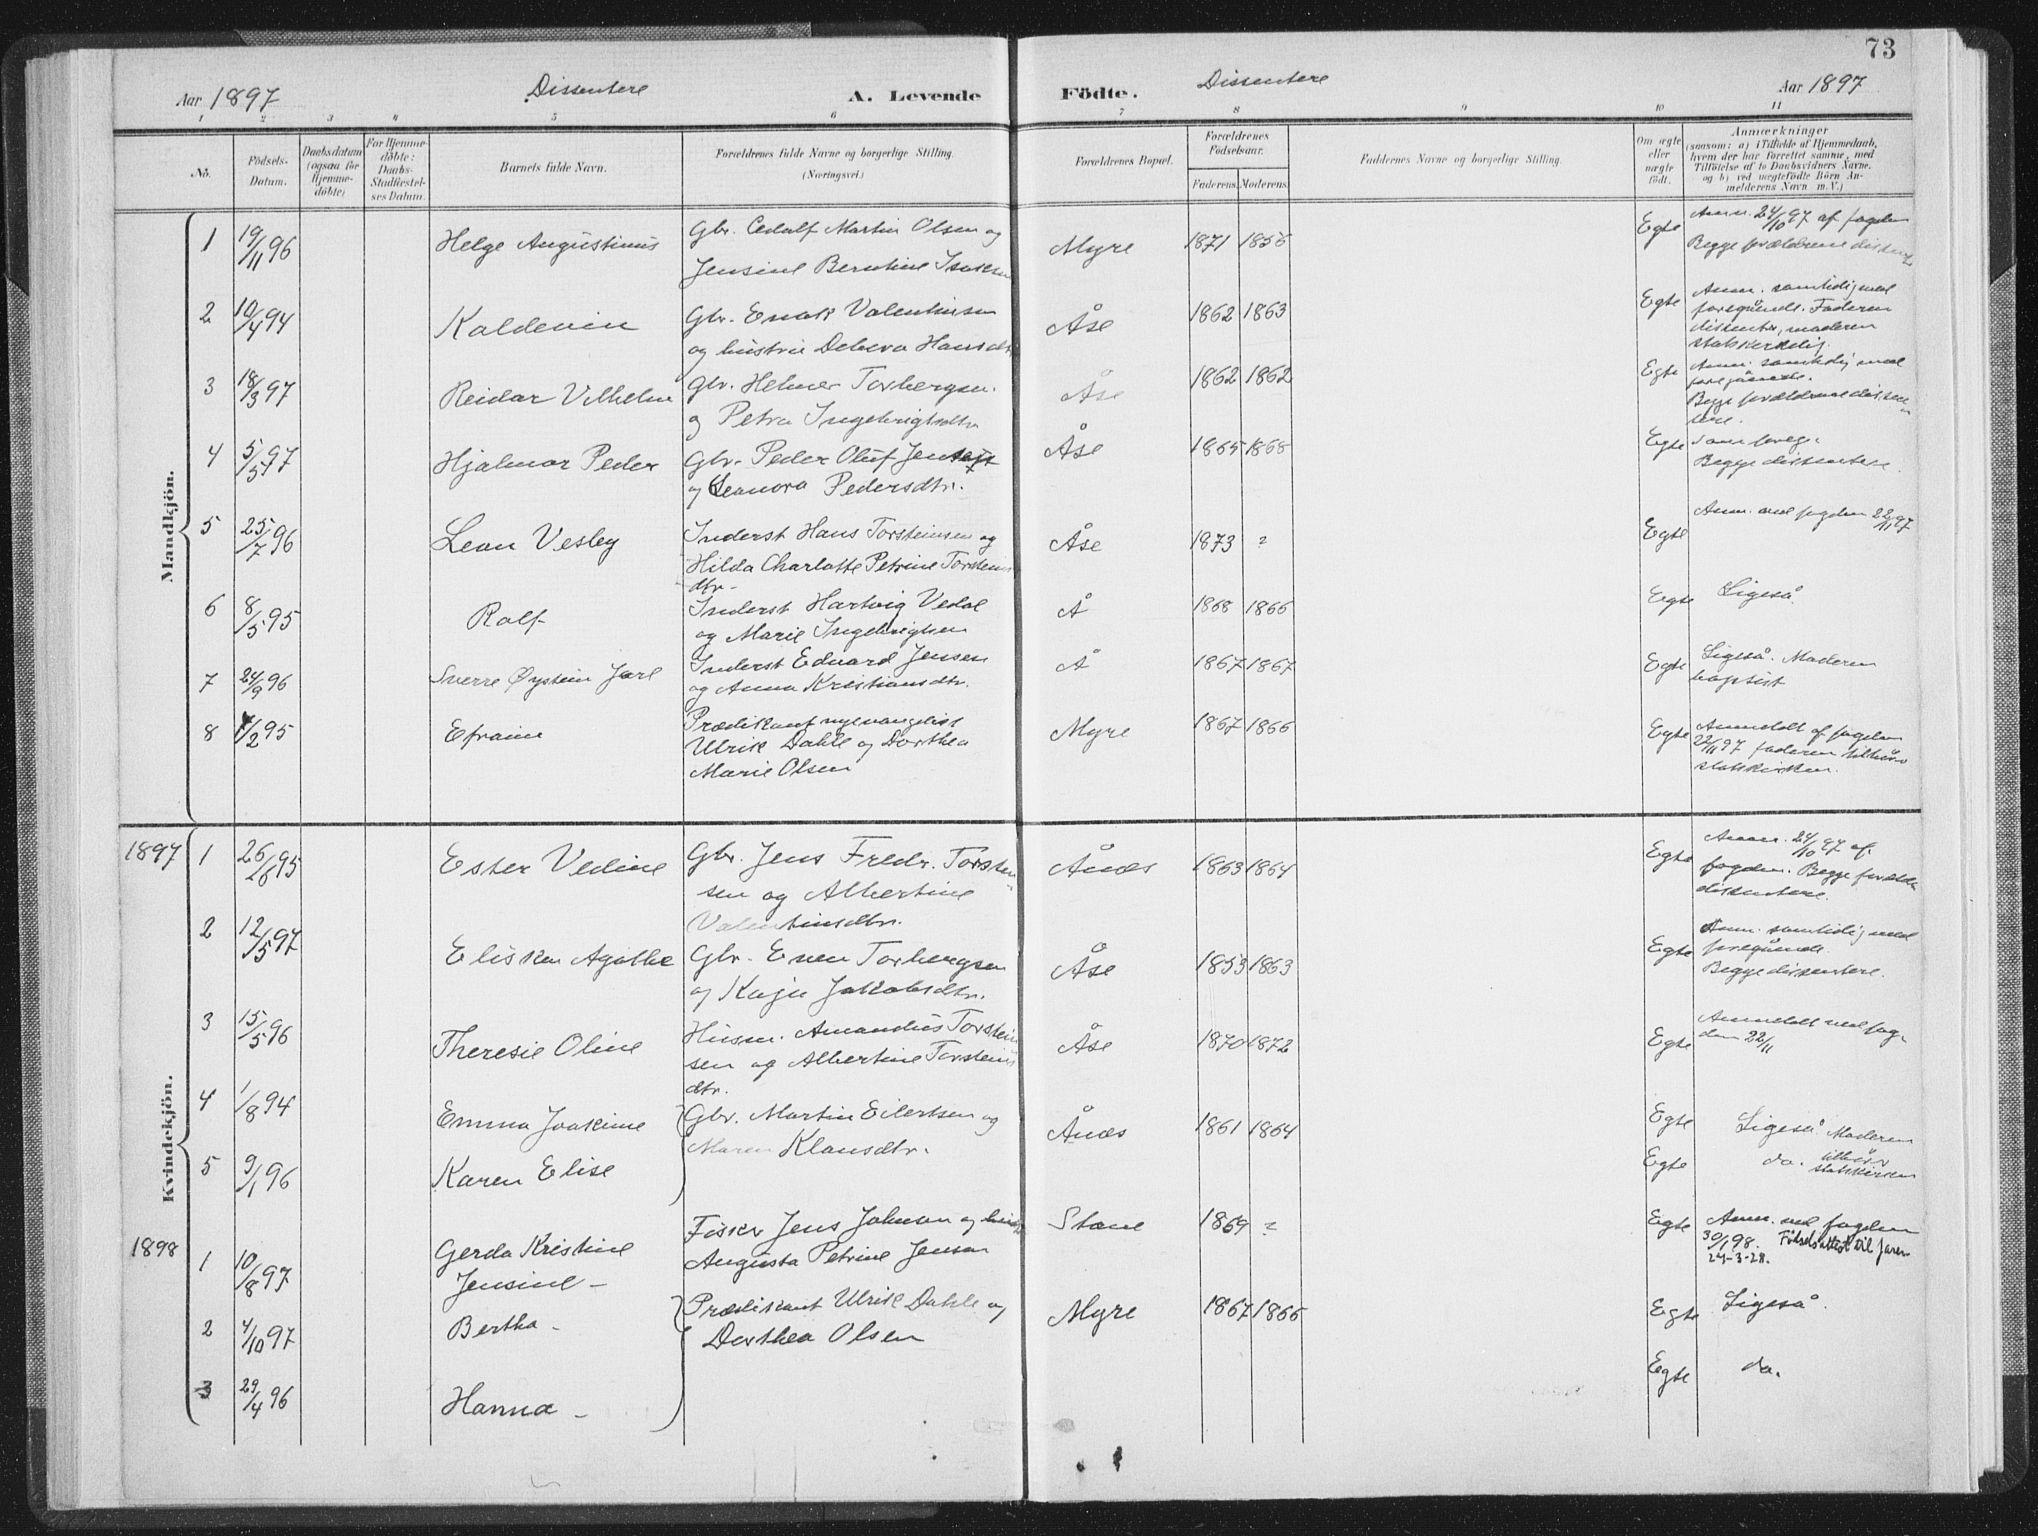 SAT, Ministerialprotokoller, klokkerbøker og fødselsregistre - Nordland, 897/L1400: Ministerialbok nr. 897A07, 1897-1908, s. 73